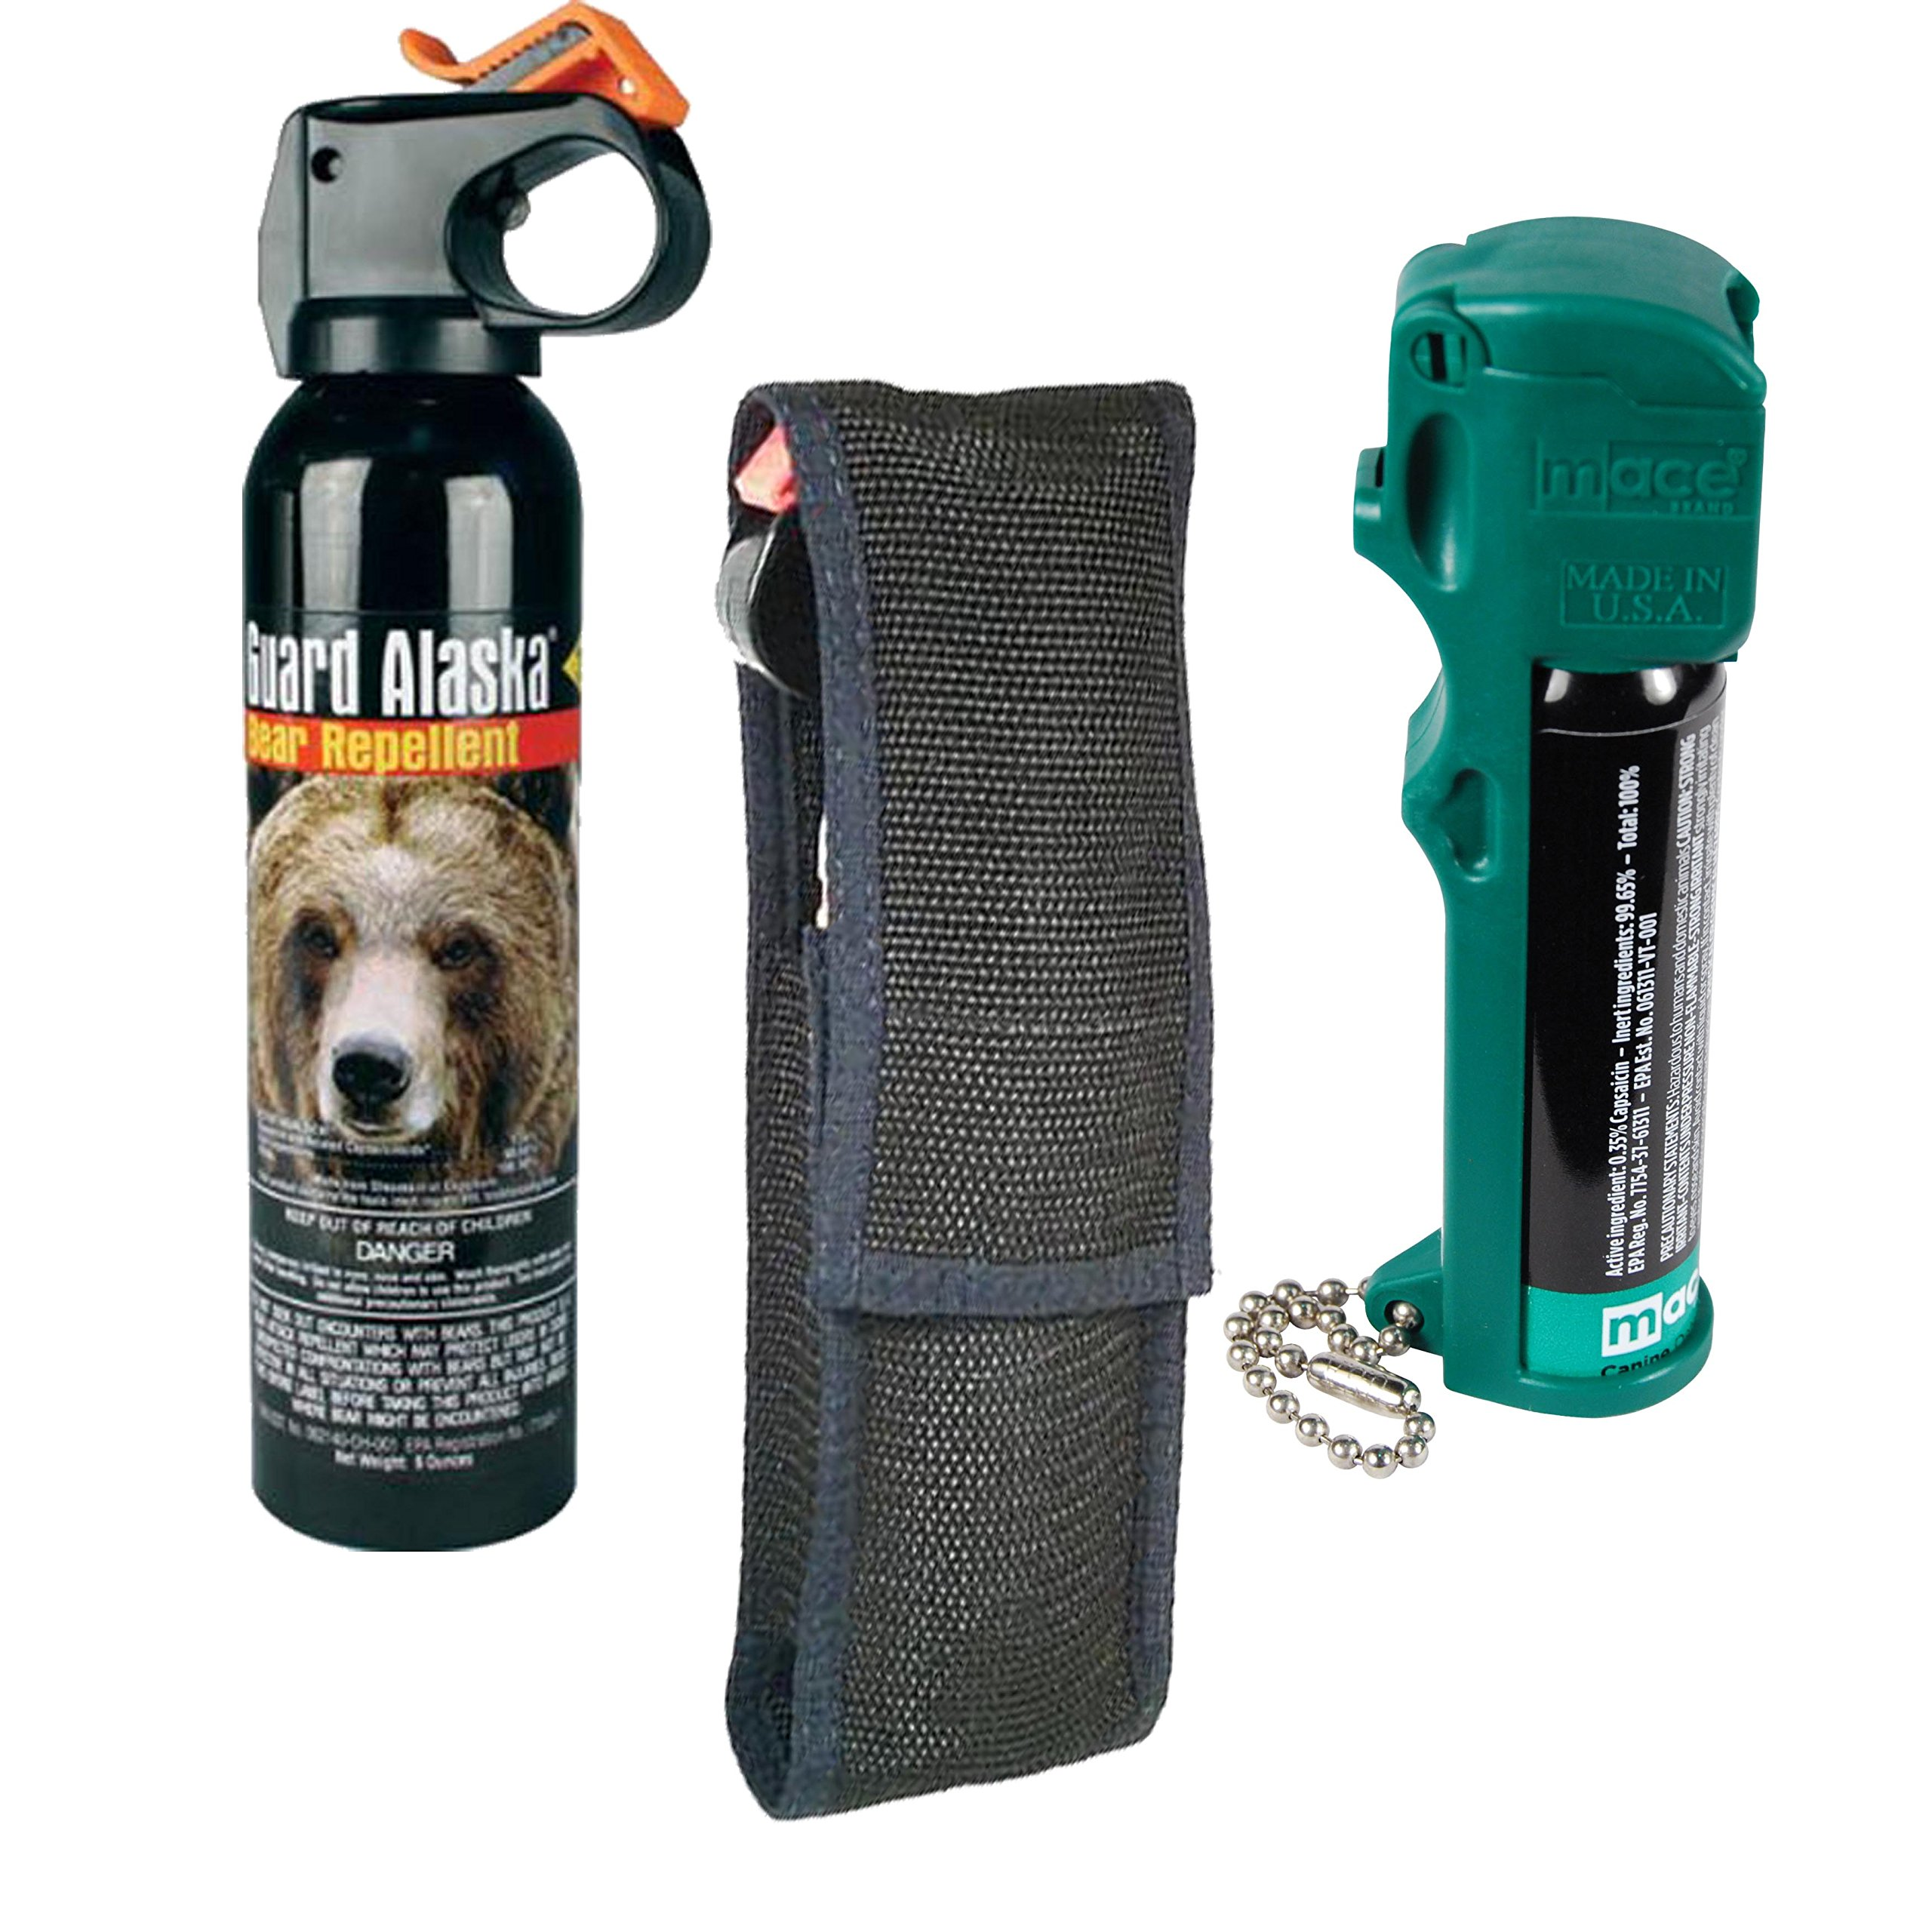 Guard Alaska Bear Spray, Holster and Mace Dog Muzzle Pepper Spray Bundle